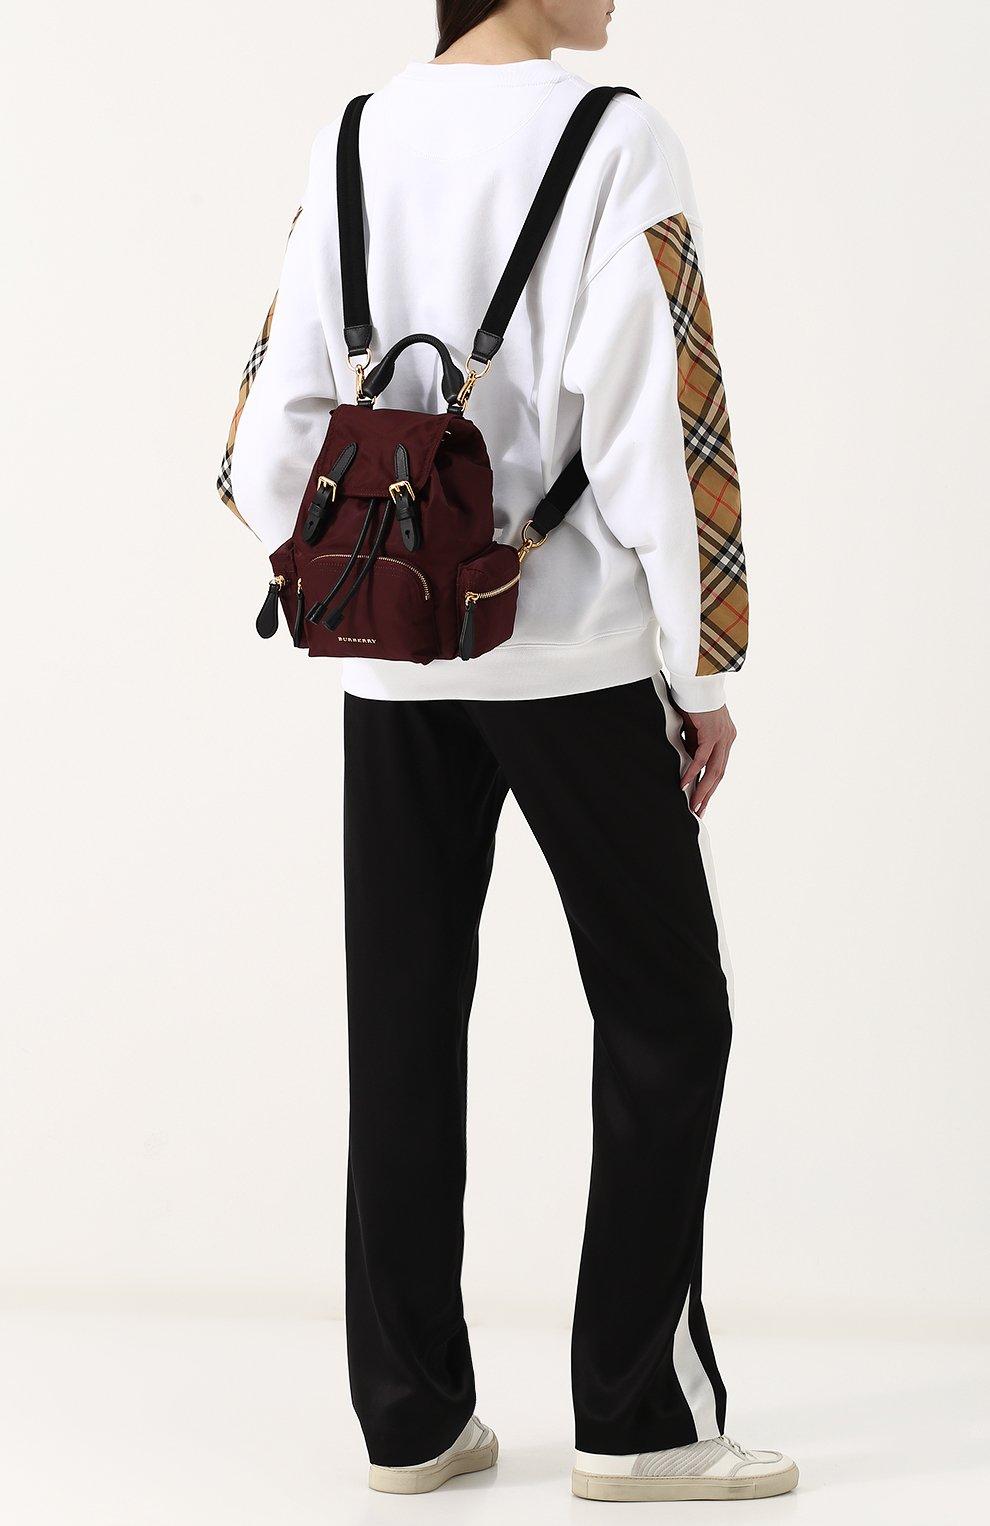 Рюкзак Rucksack small с кожаной отделкой | Фото №2